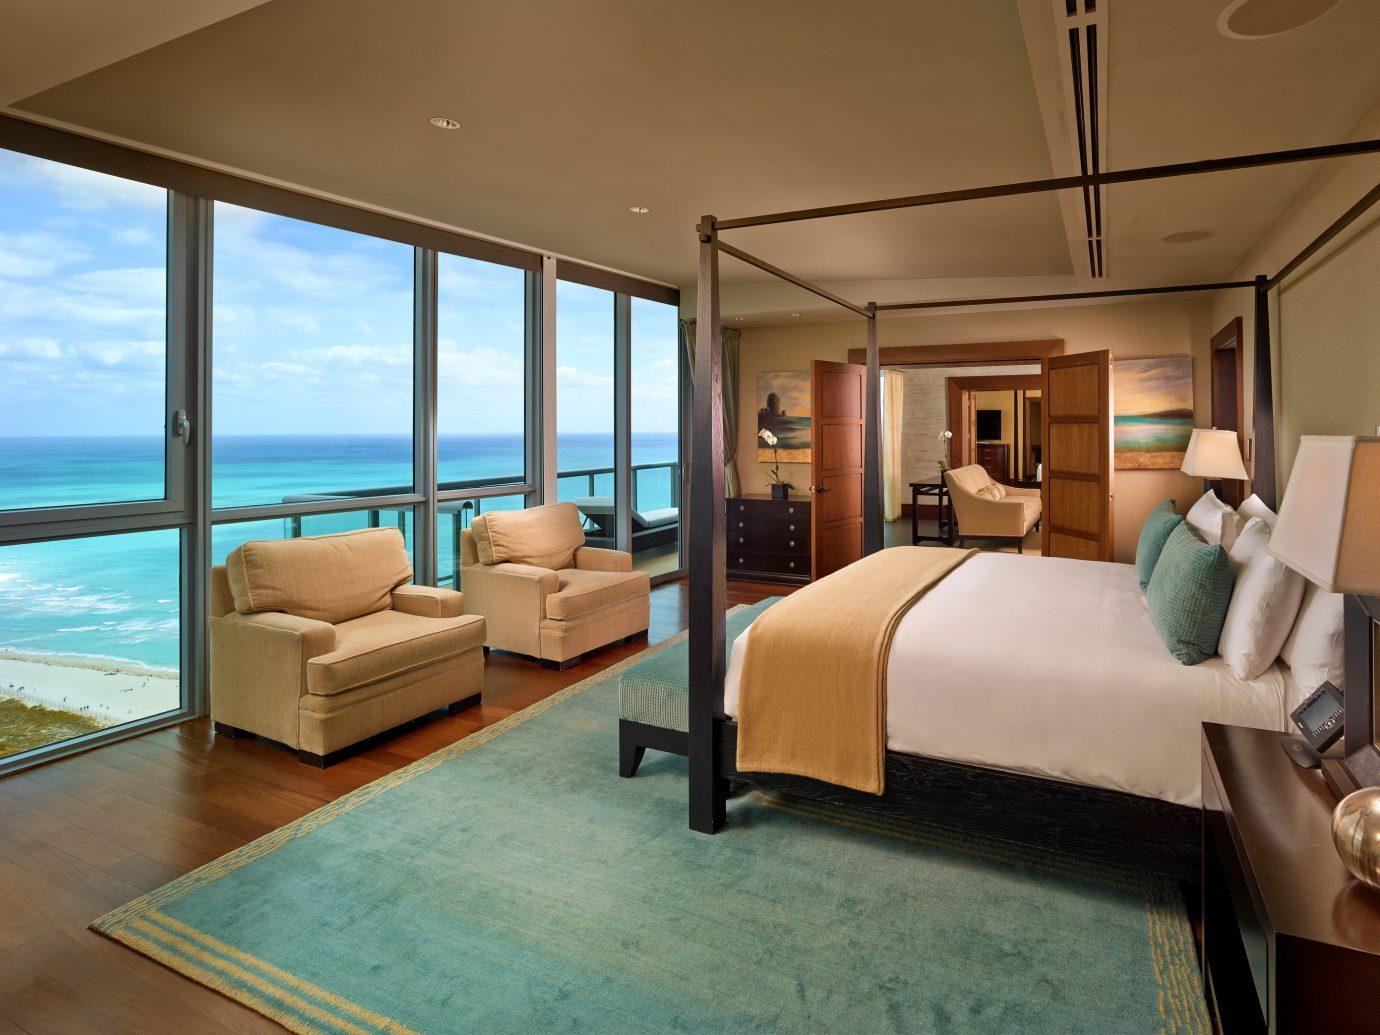 Bedroom at The Setai Miami Hotel